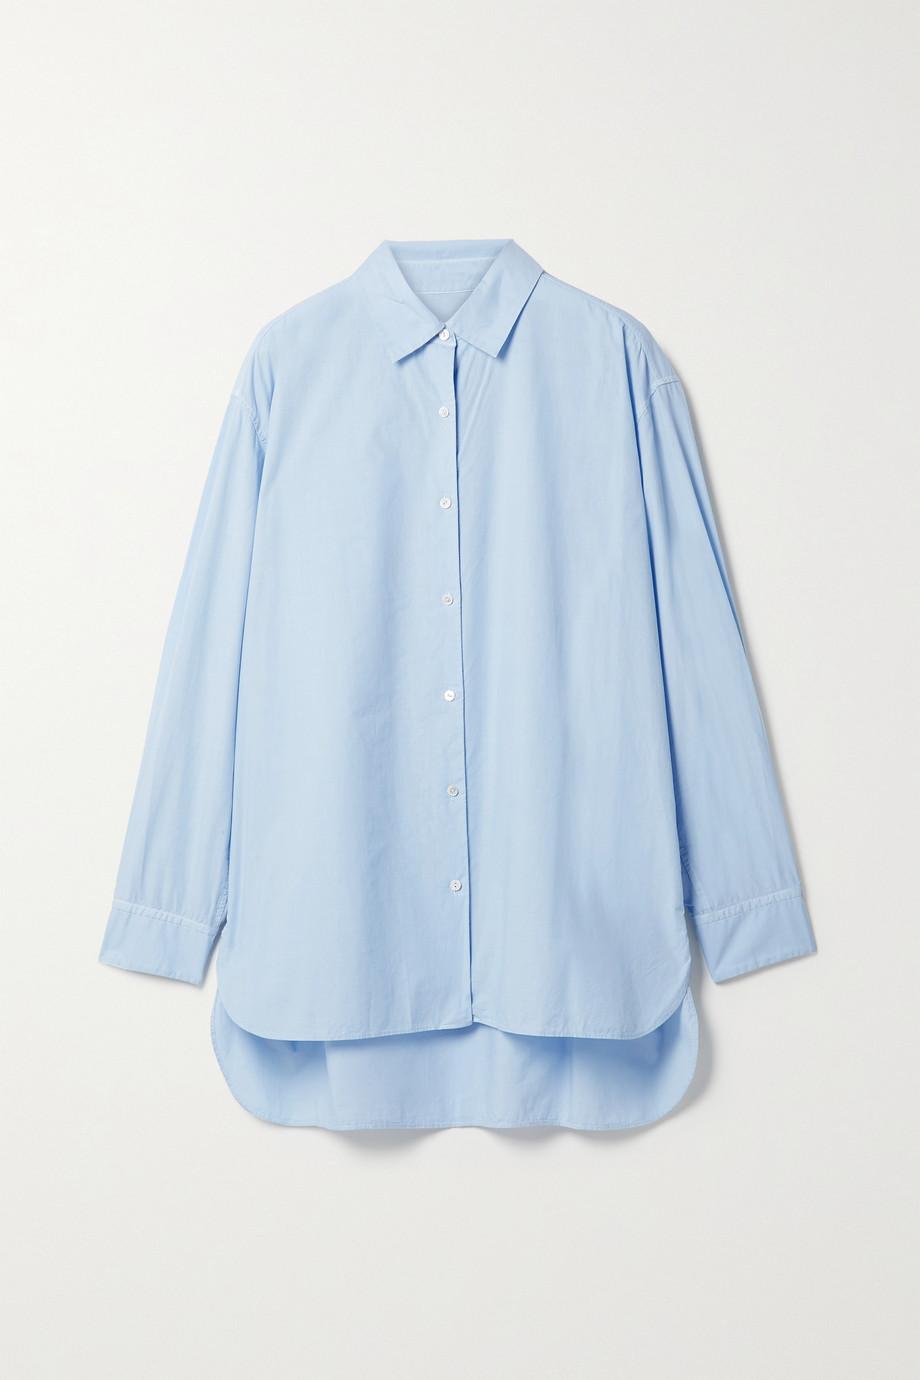 Nili Lotan Yorke cotton shirt